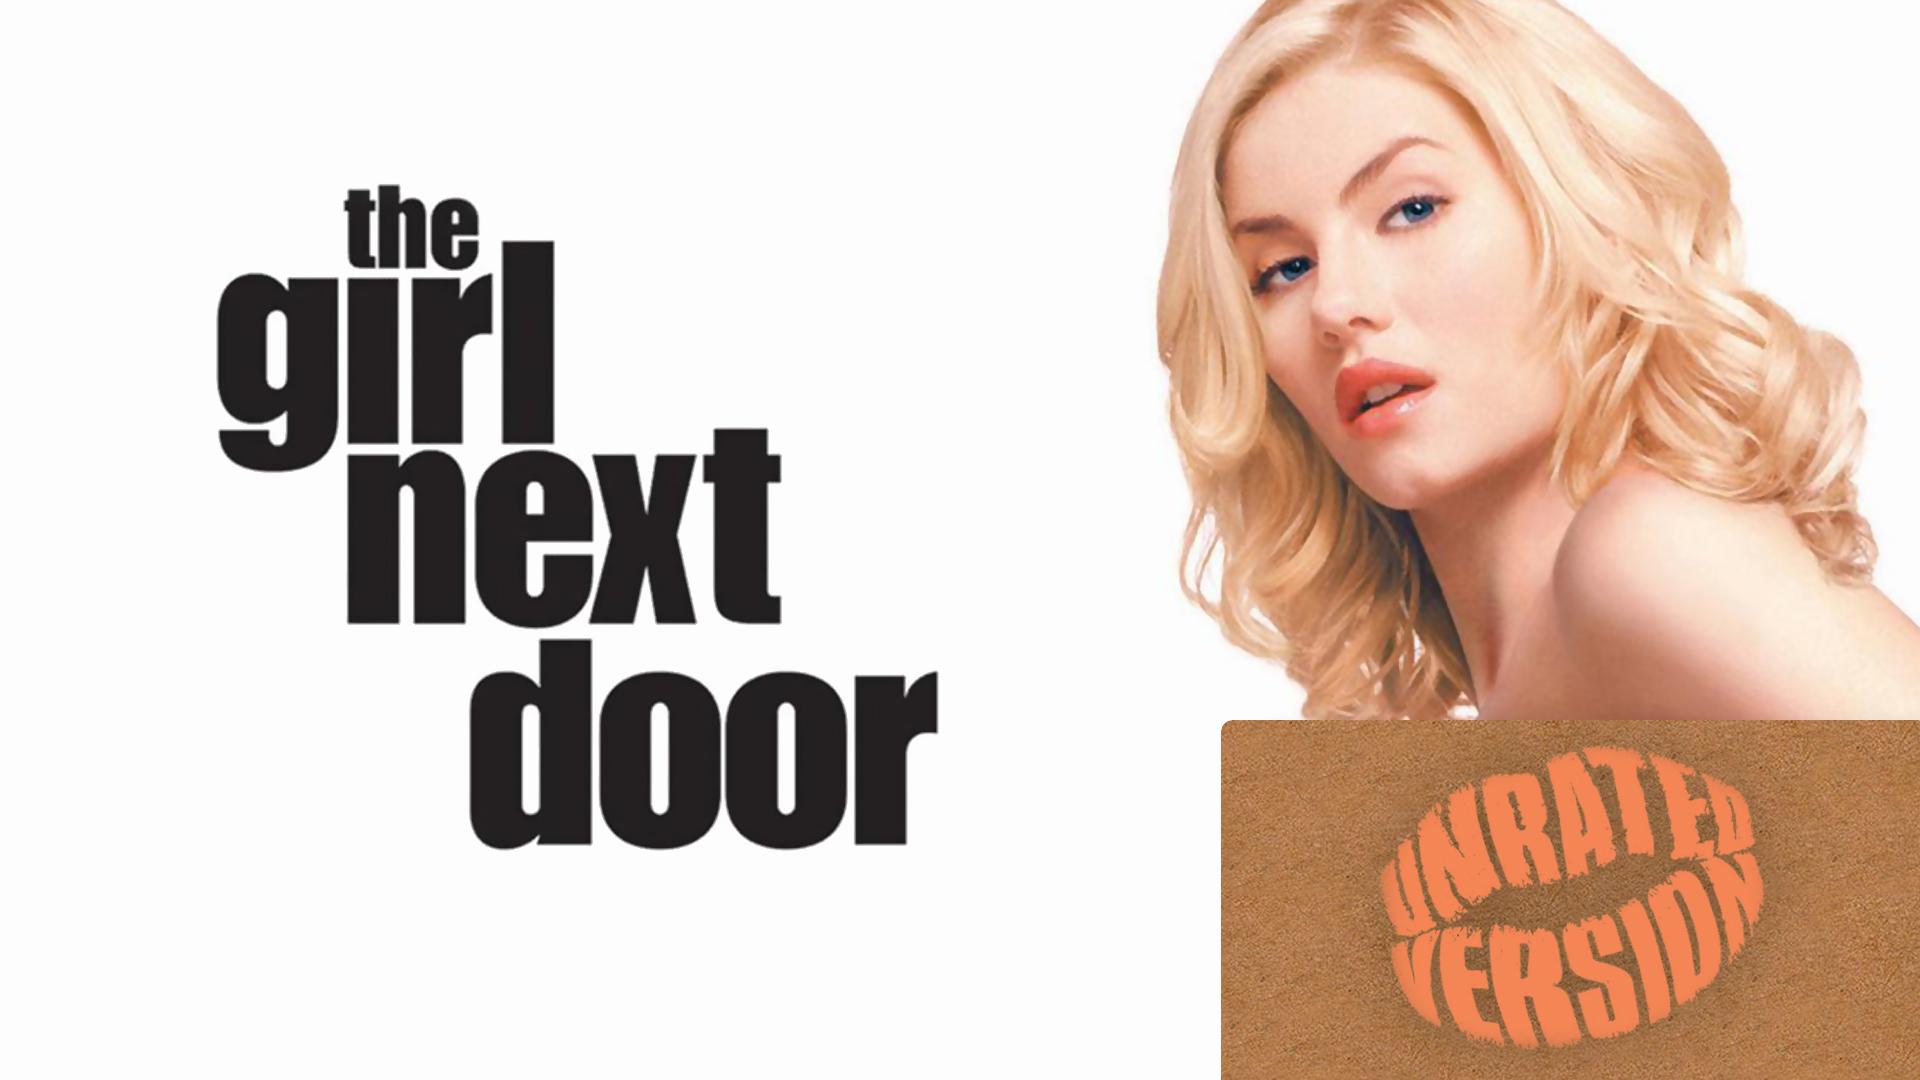 The Girl Next Door (Unrated)